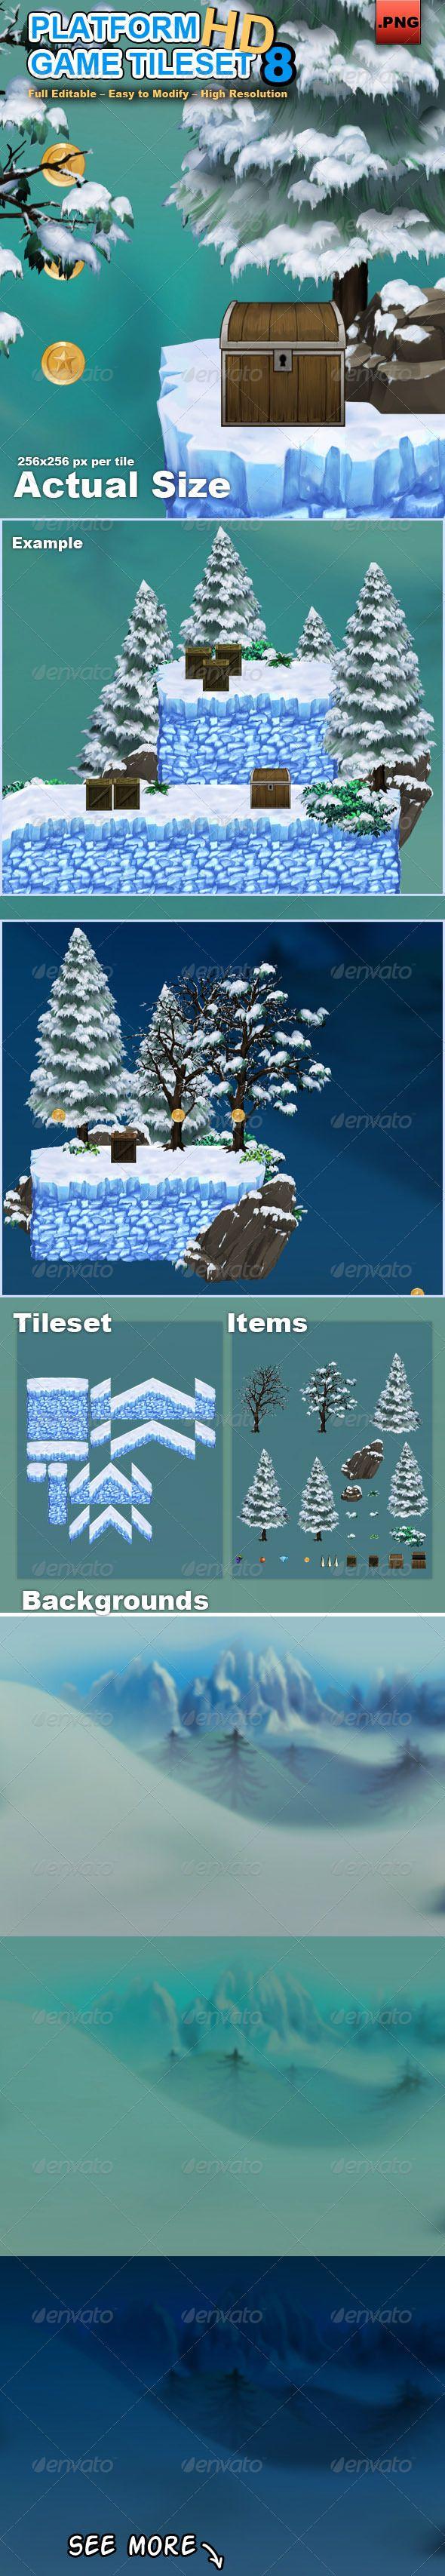 Platform Game Tileset 8 HD Snow